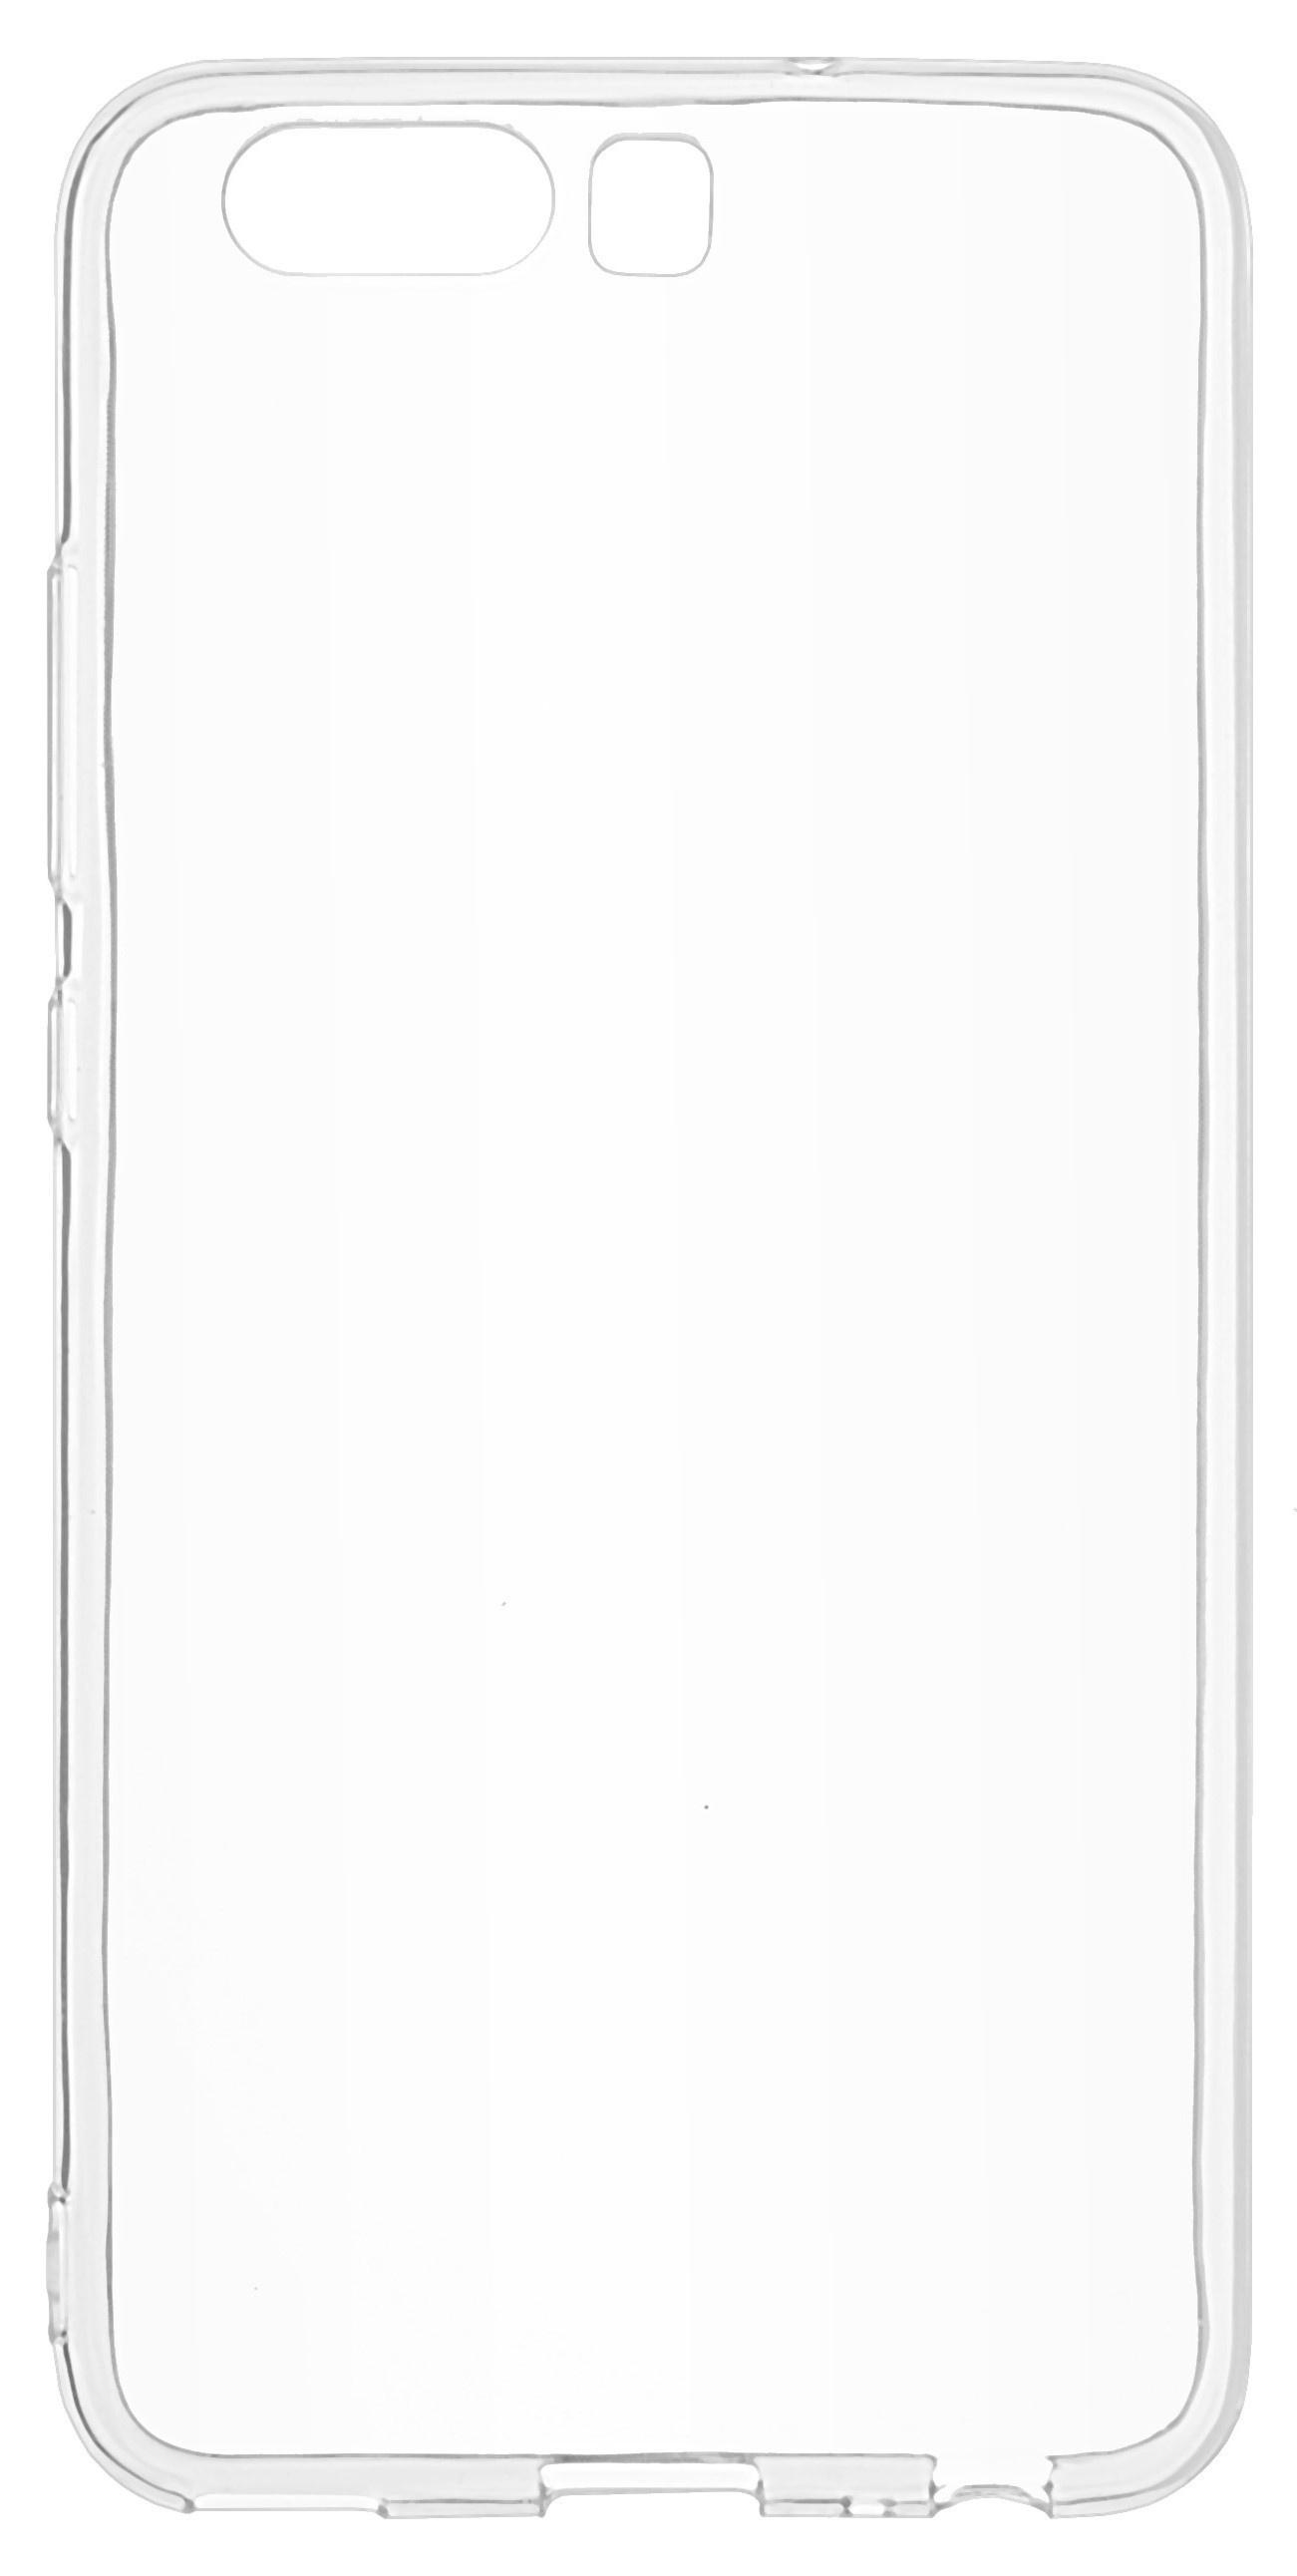 Чехол для сотового телефона skinBOX Slim Silicone, 4630042524439, прозрачный цена и фото